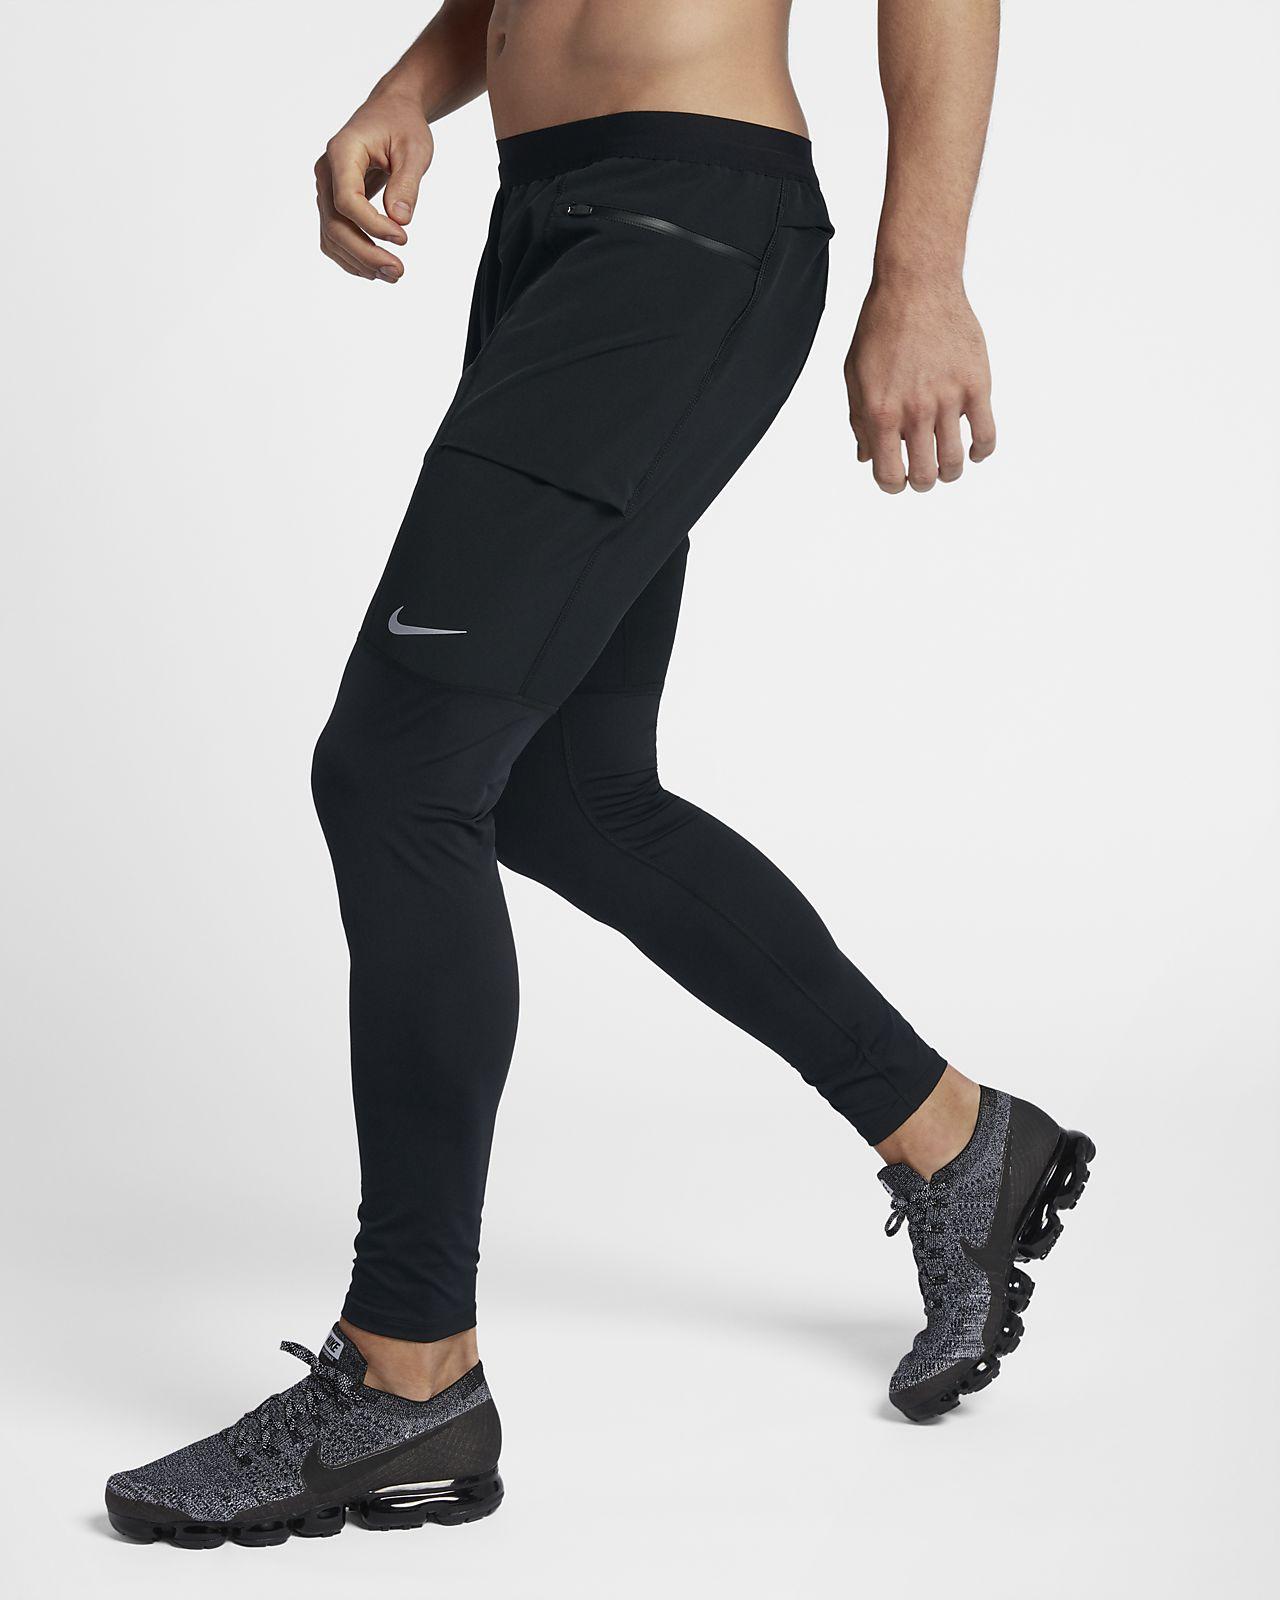 Utility Running Nike De Pantalón Es Hombre HTqwz8xBqn